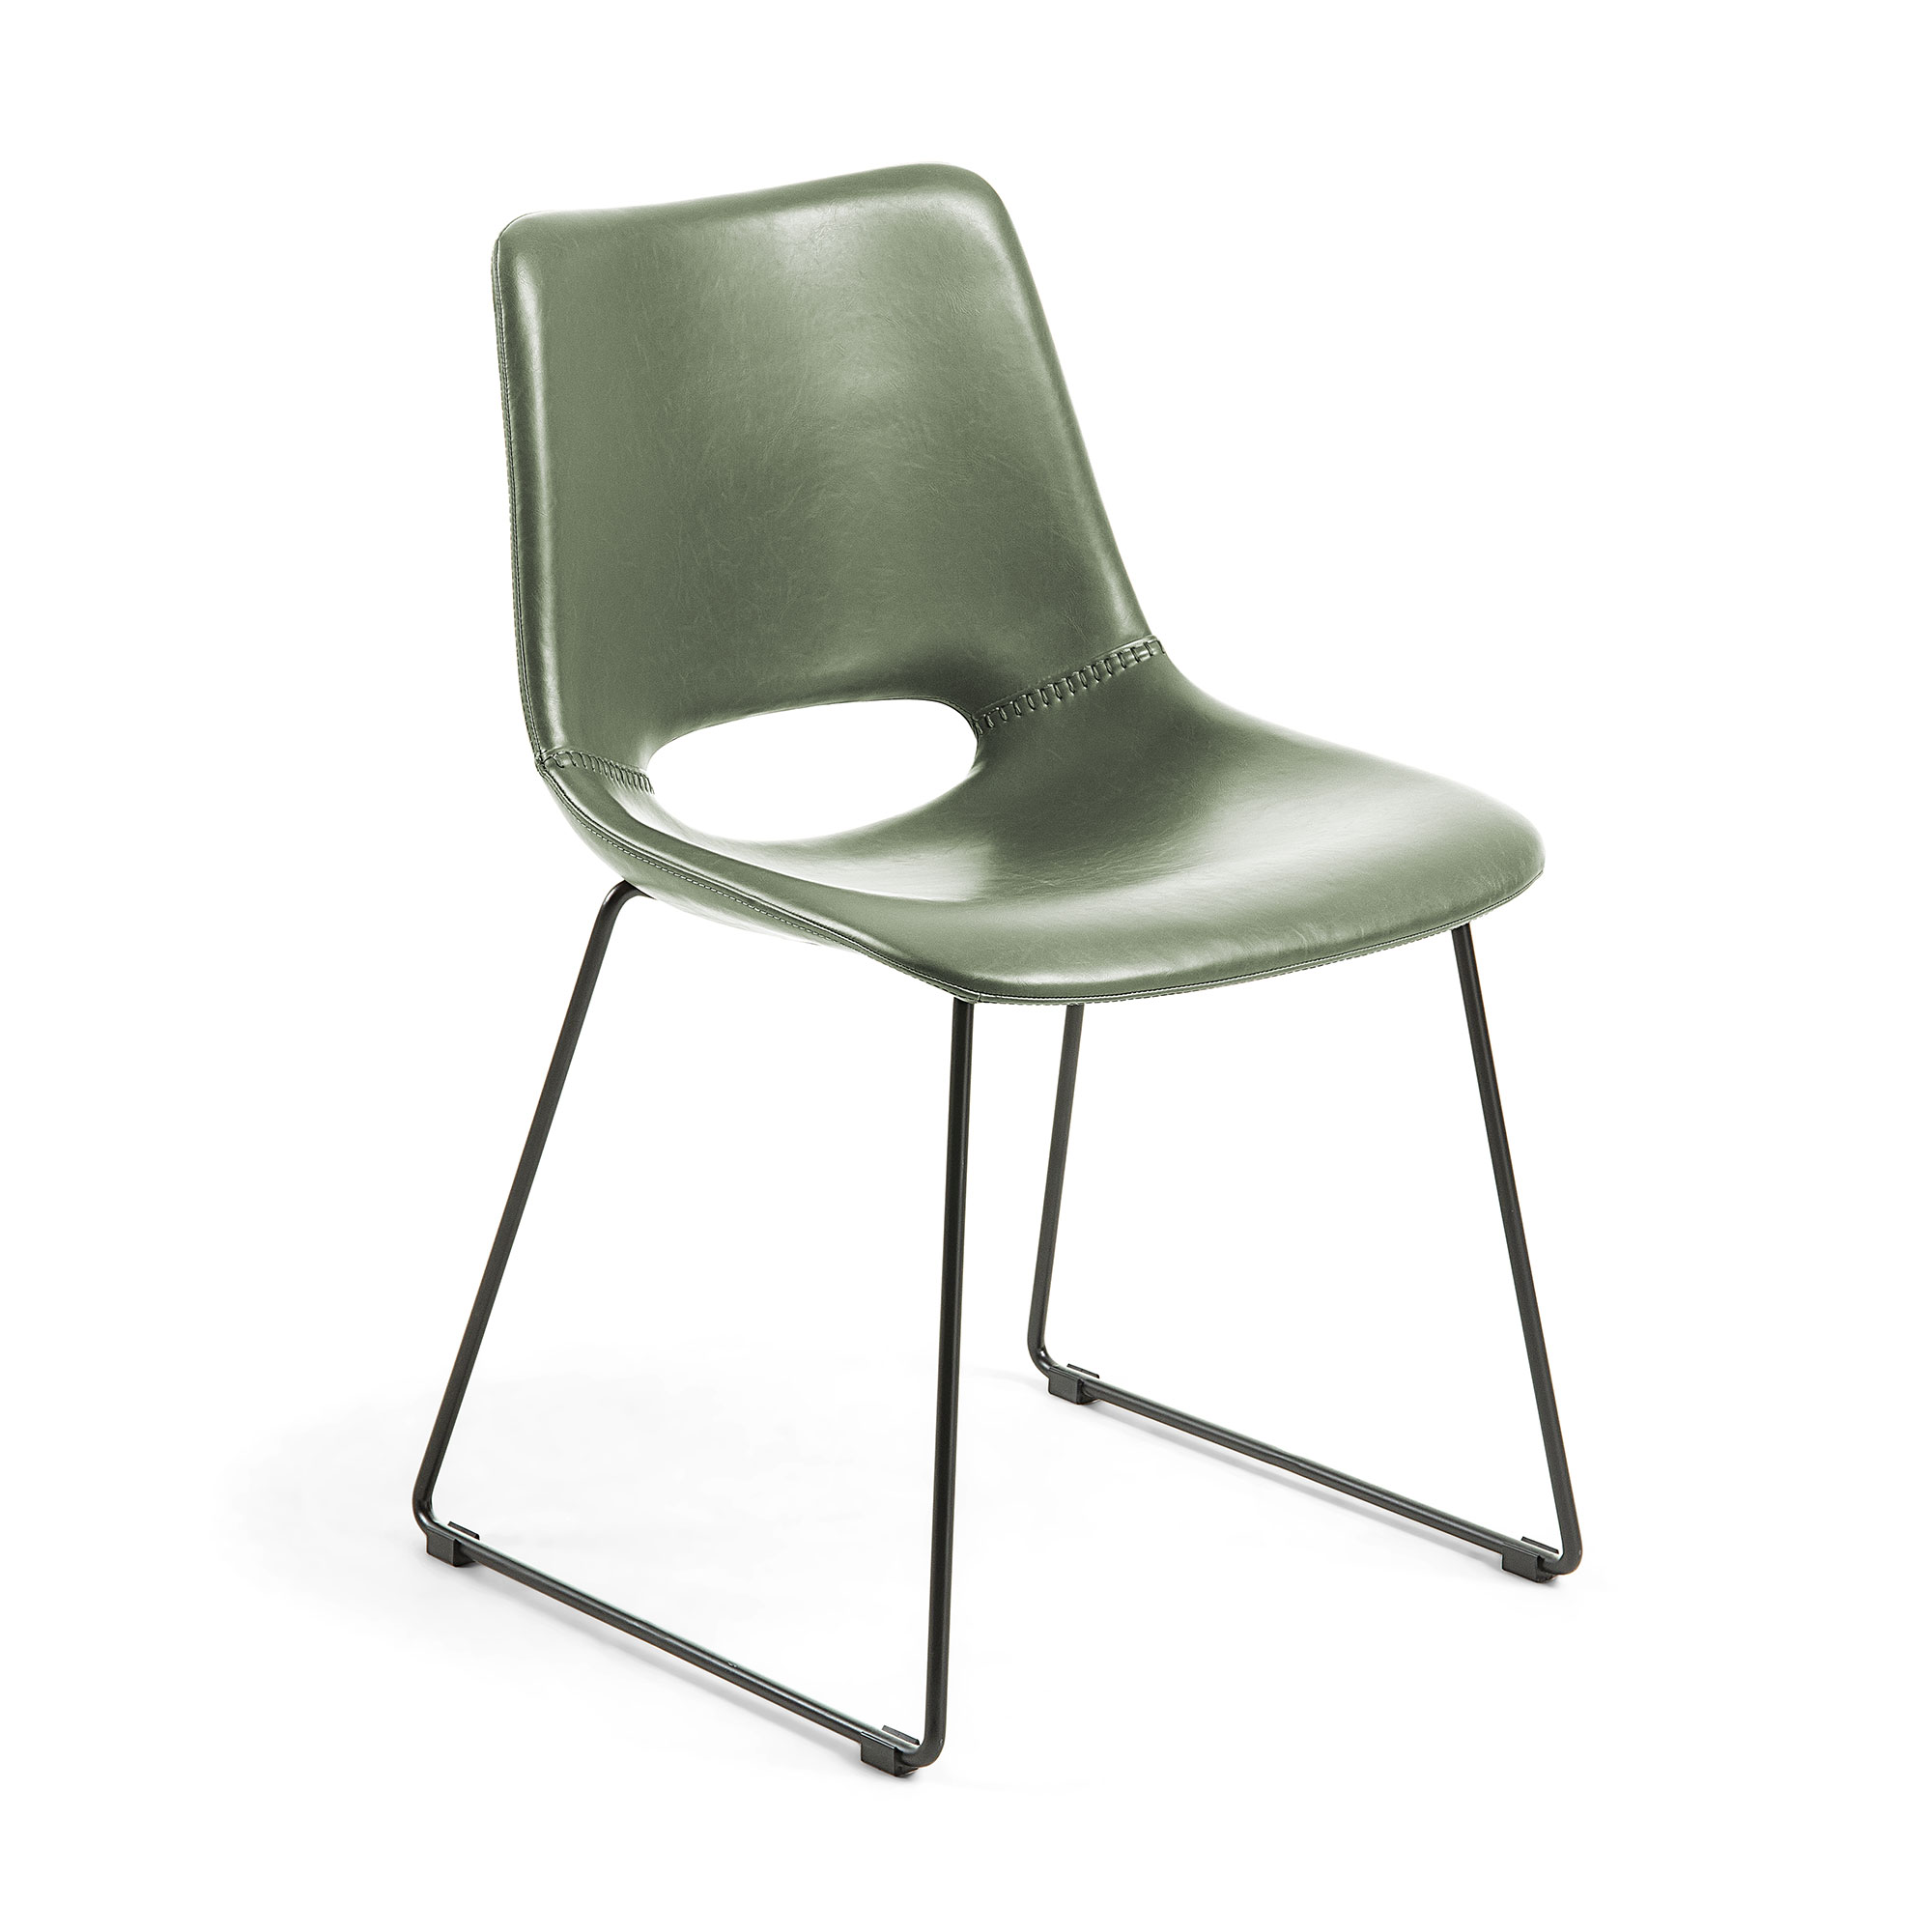 Стул ziggy (la forma) зеленый 49x78x55 см.